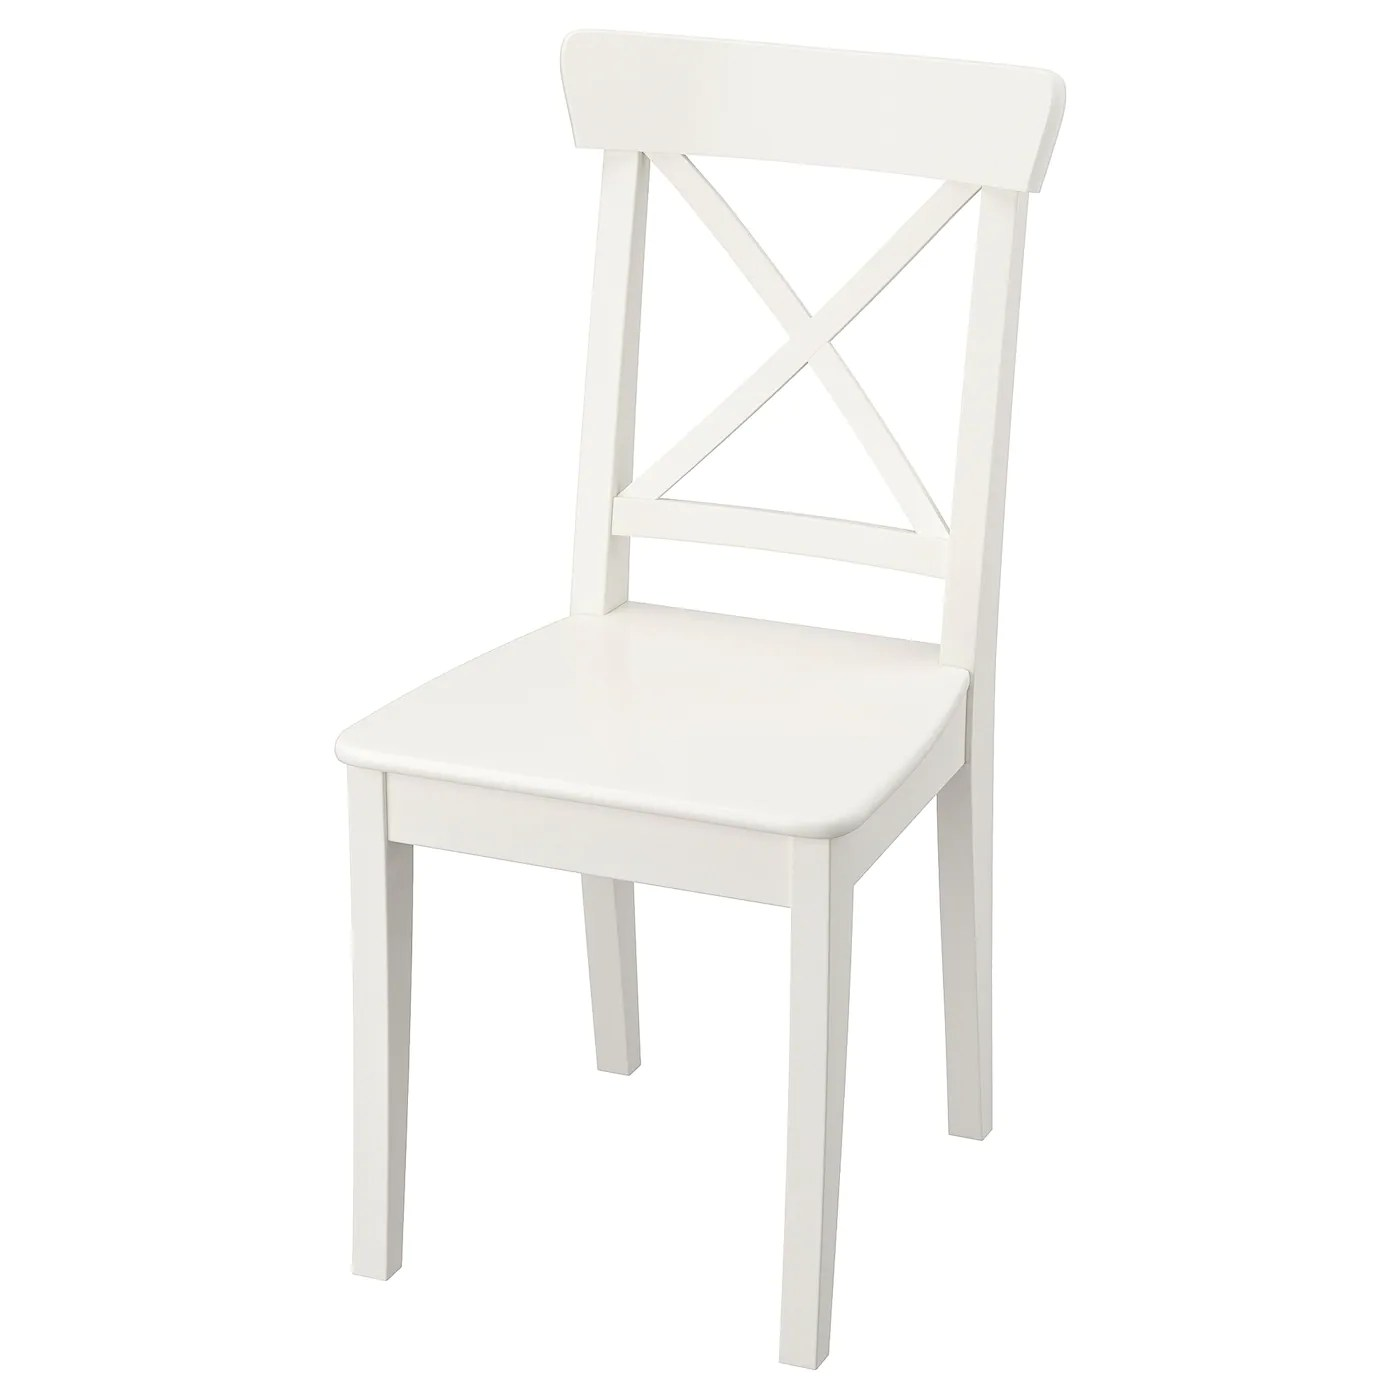 Chaises De Salle A Manger Ikea